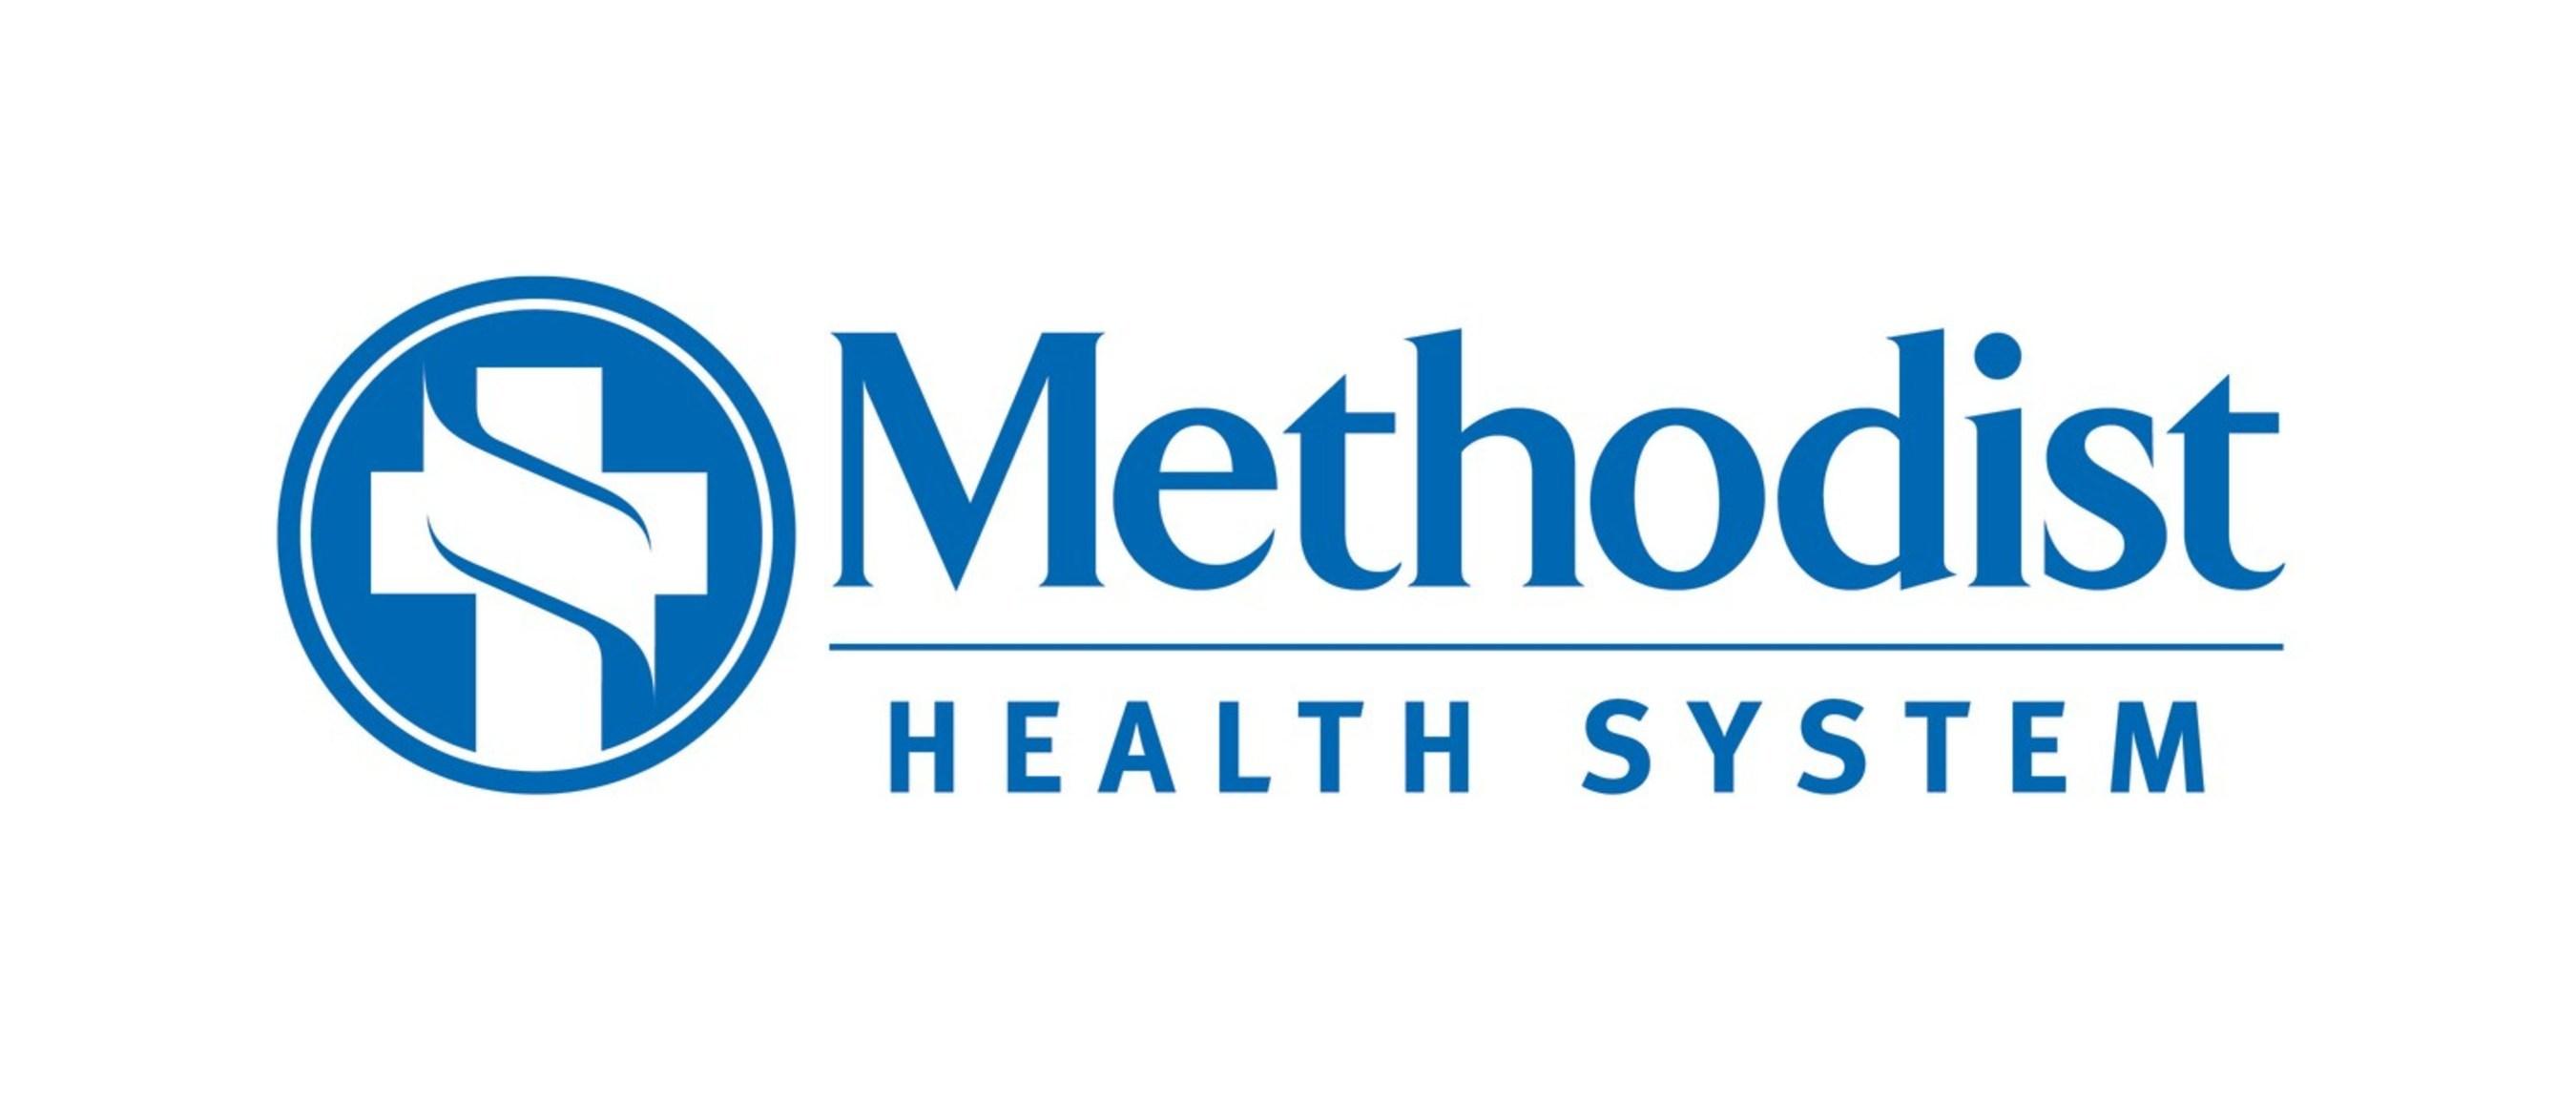 Methodist Health System Affiliated ACO Achieves Medicare Savings for 4th Consecutive Year (PRNewsfoto/Methodist Health System)